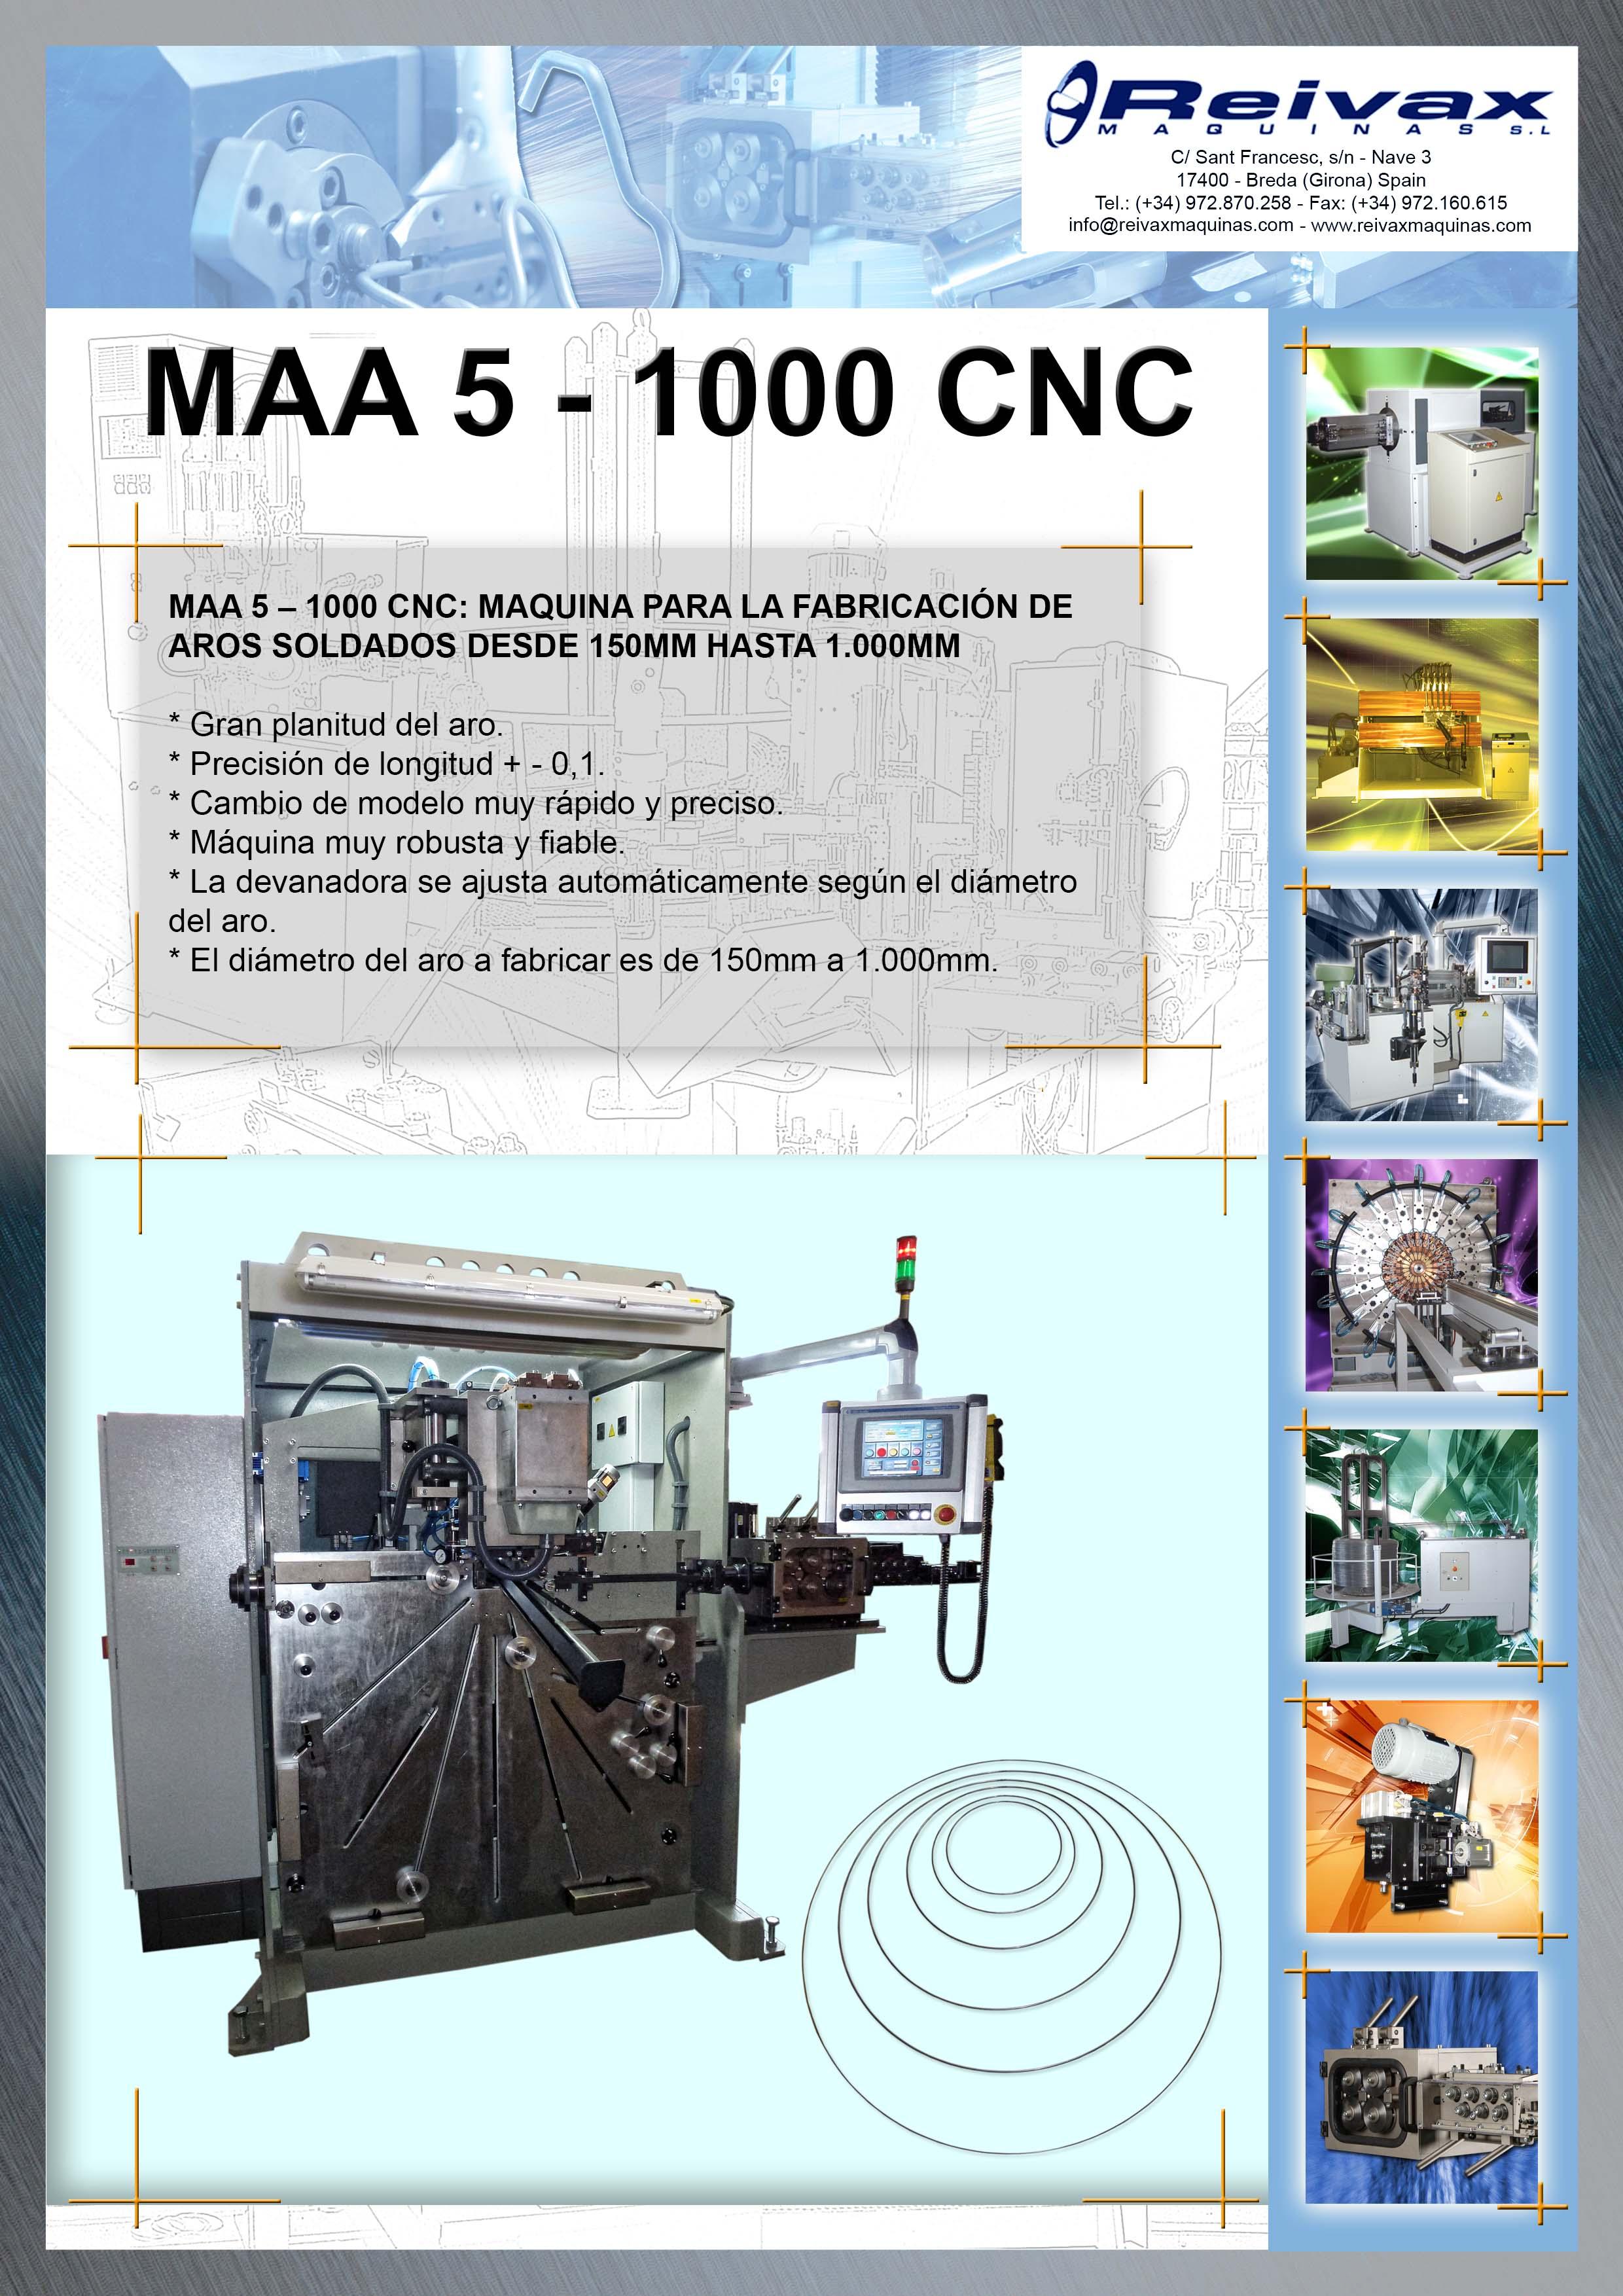 ReivaxMaquinas: Ficha MAA 5 -1000 CNC